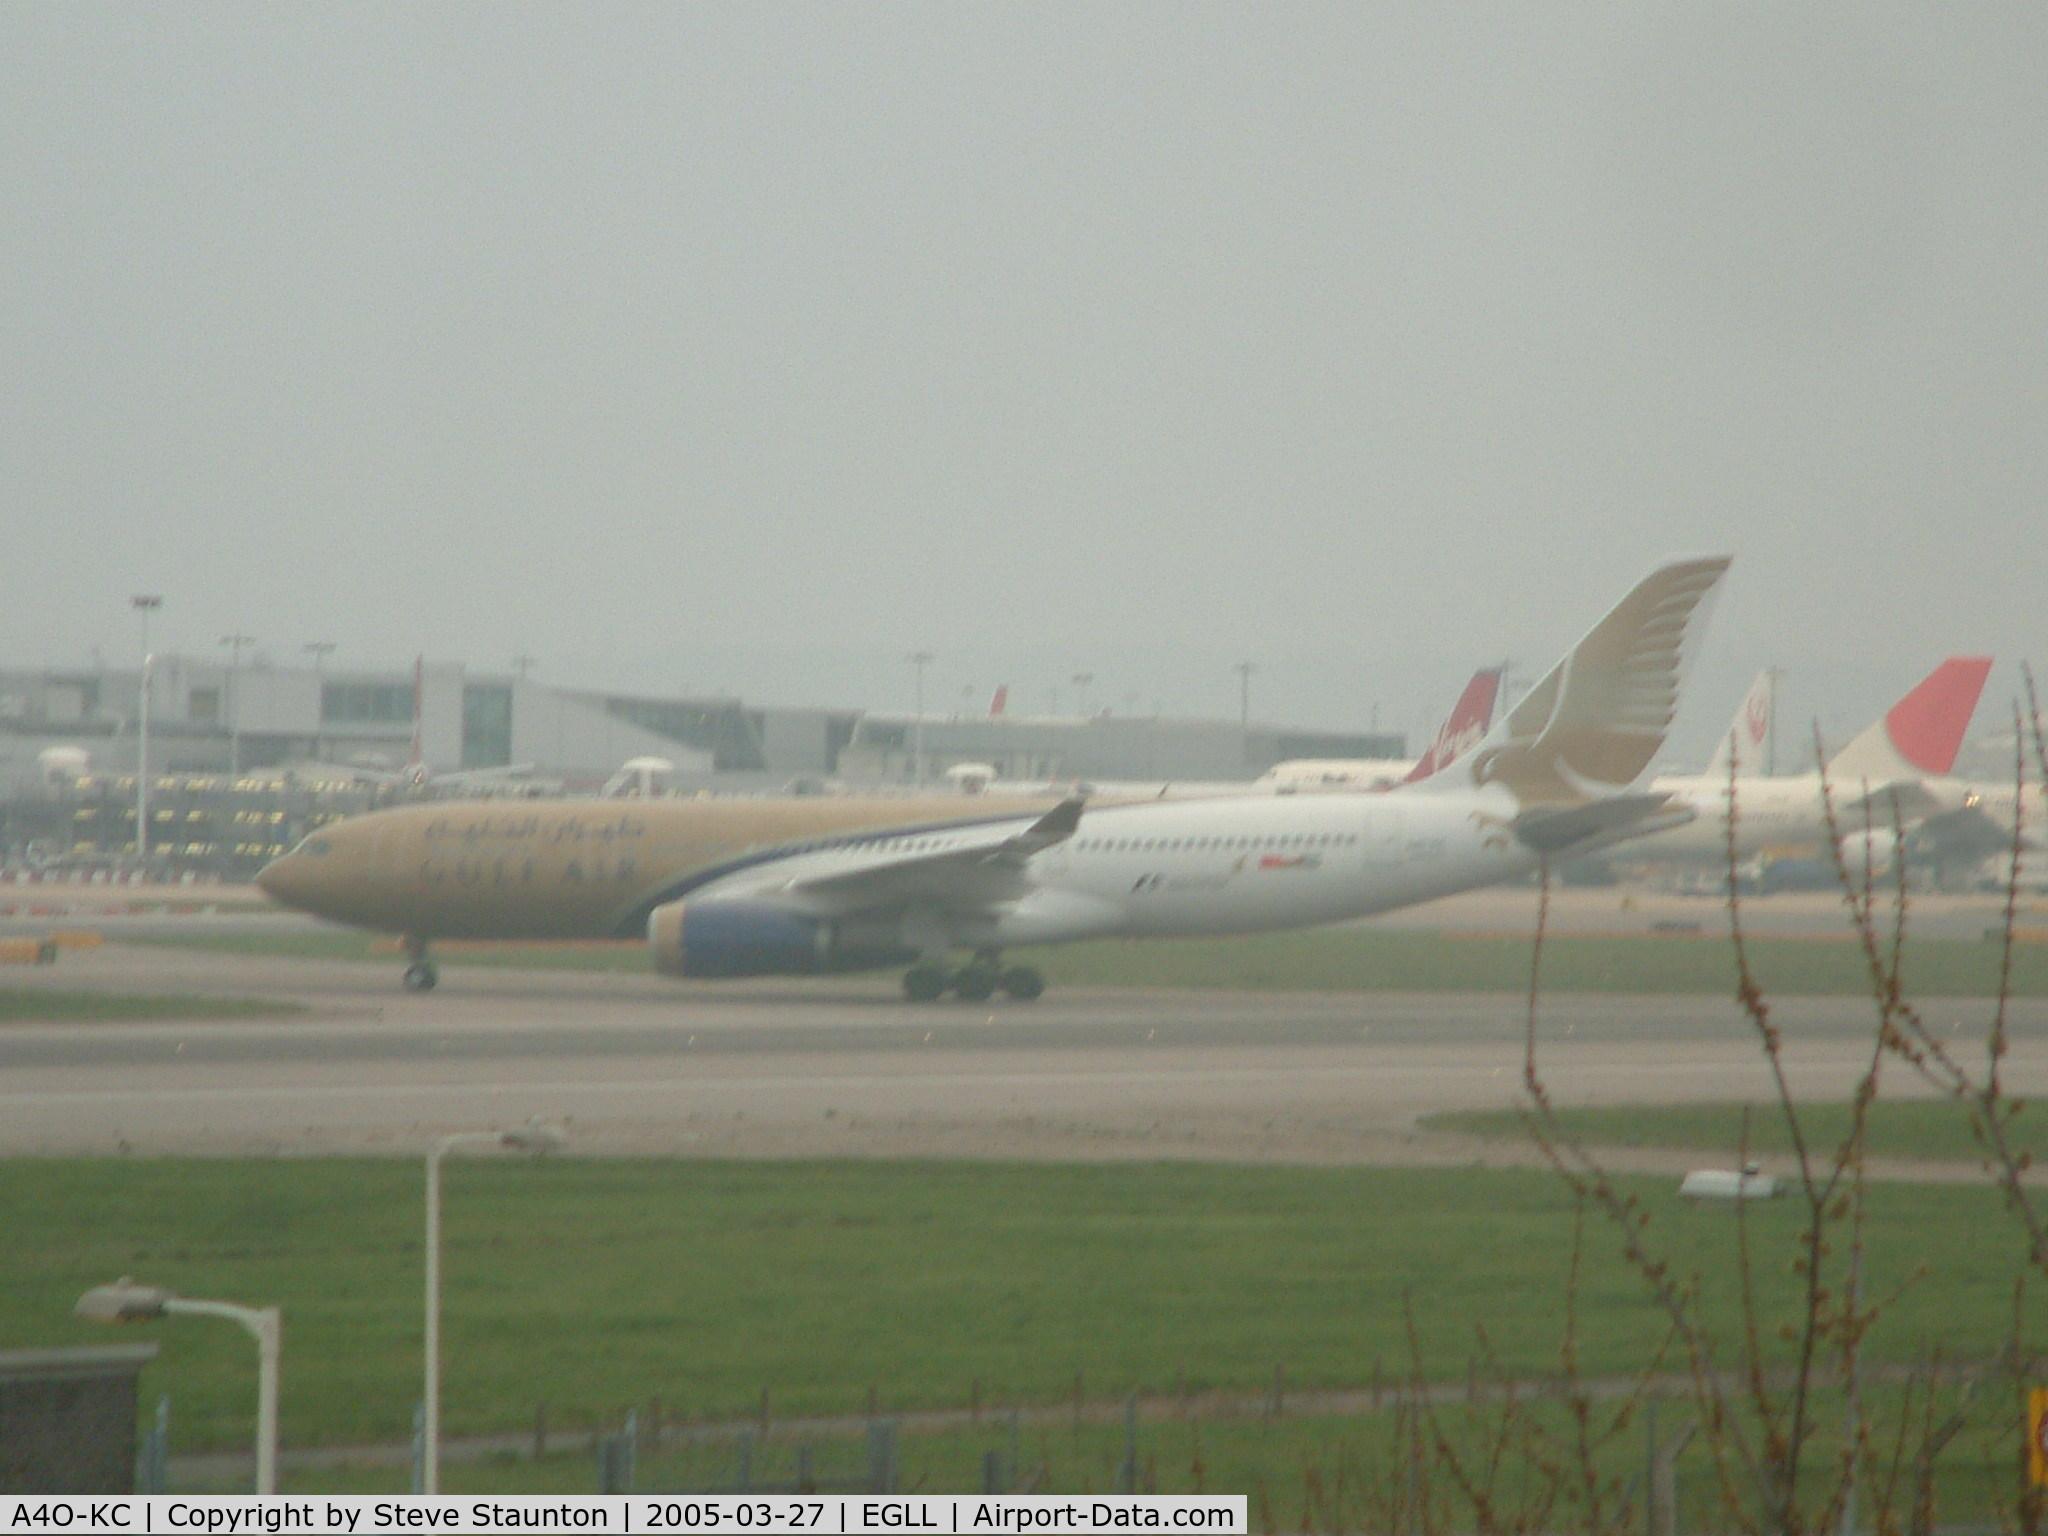 A4O-KC, 1999 Airbus A330-243 C/N 286, Taken at Heathrow Airport March 2005